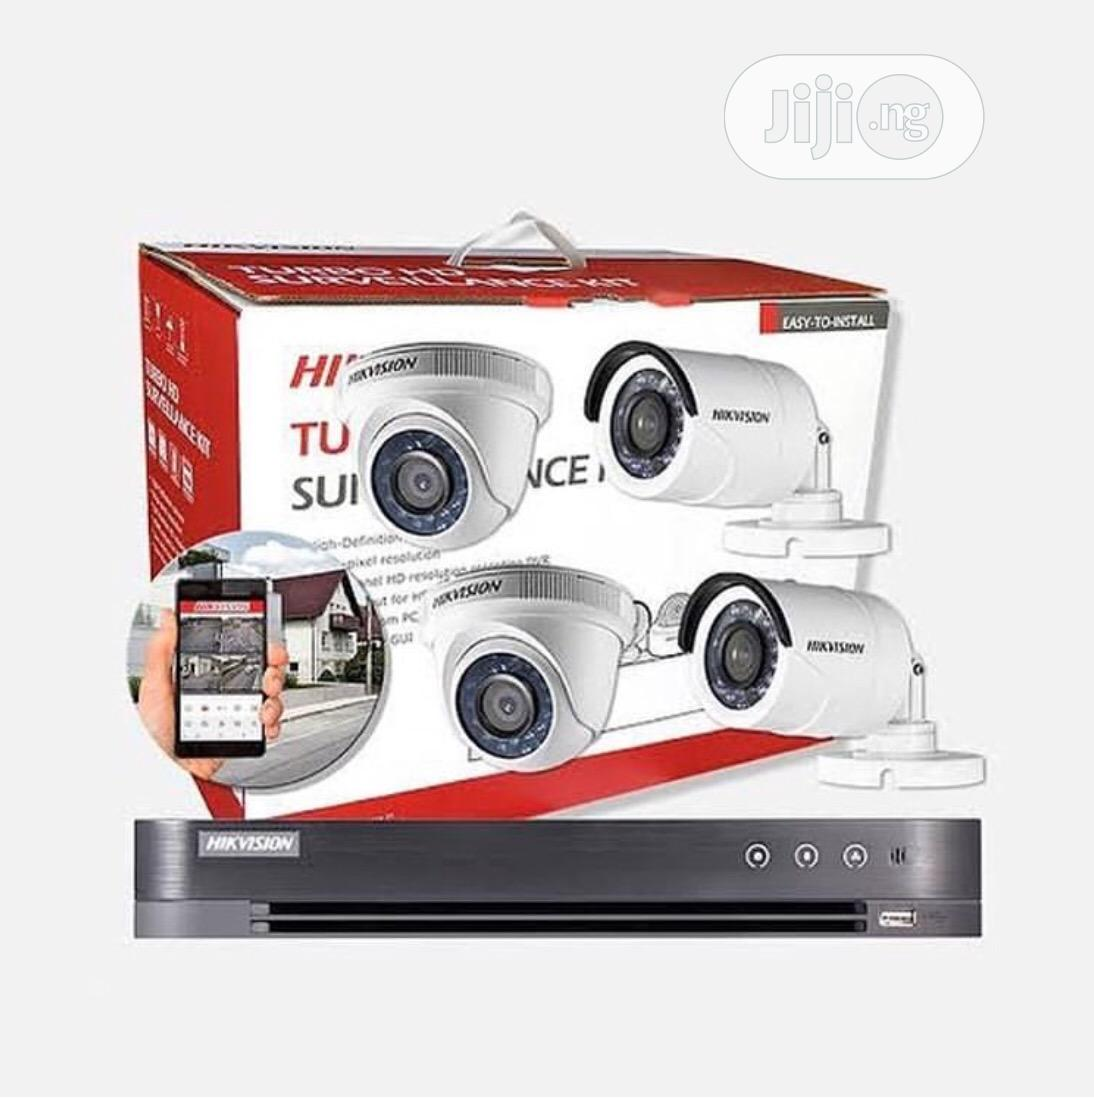 Hikvision Turbo HD CCTV Surveillance Kit